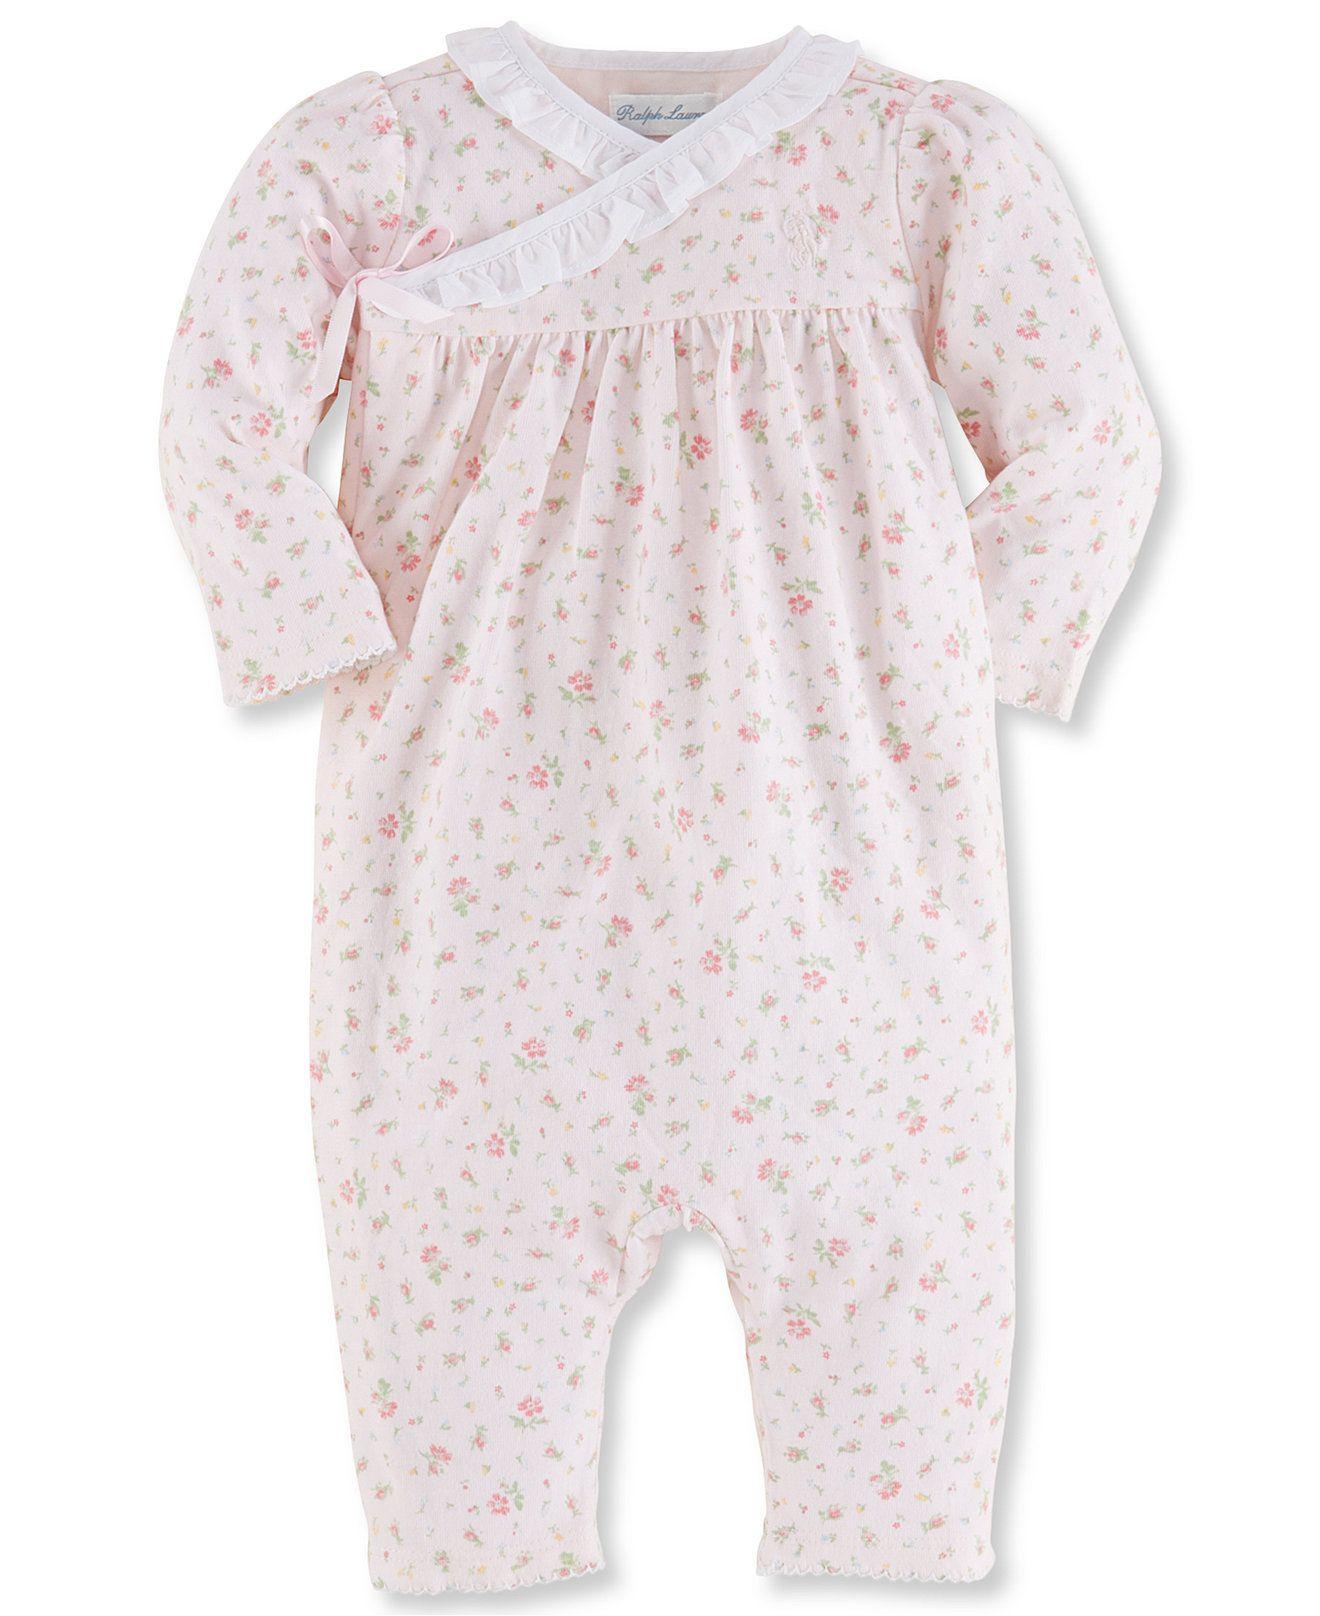 Ralph Lauren Baby Girls Printed Coveralls Kids Newborn Shop